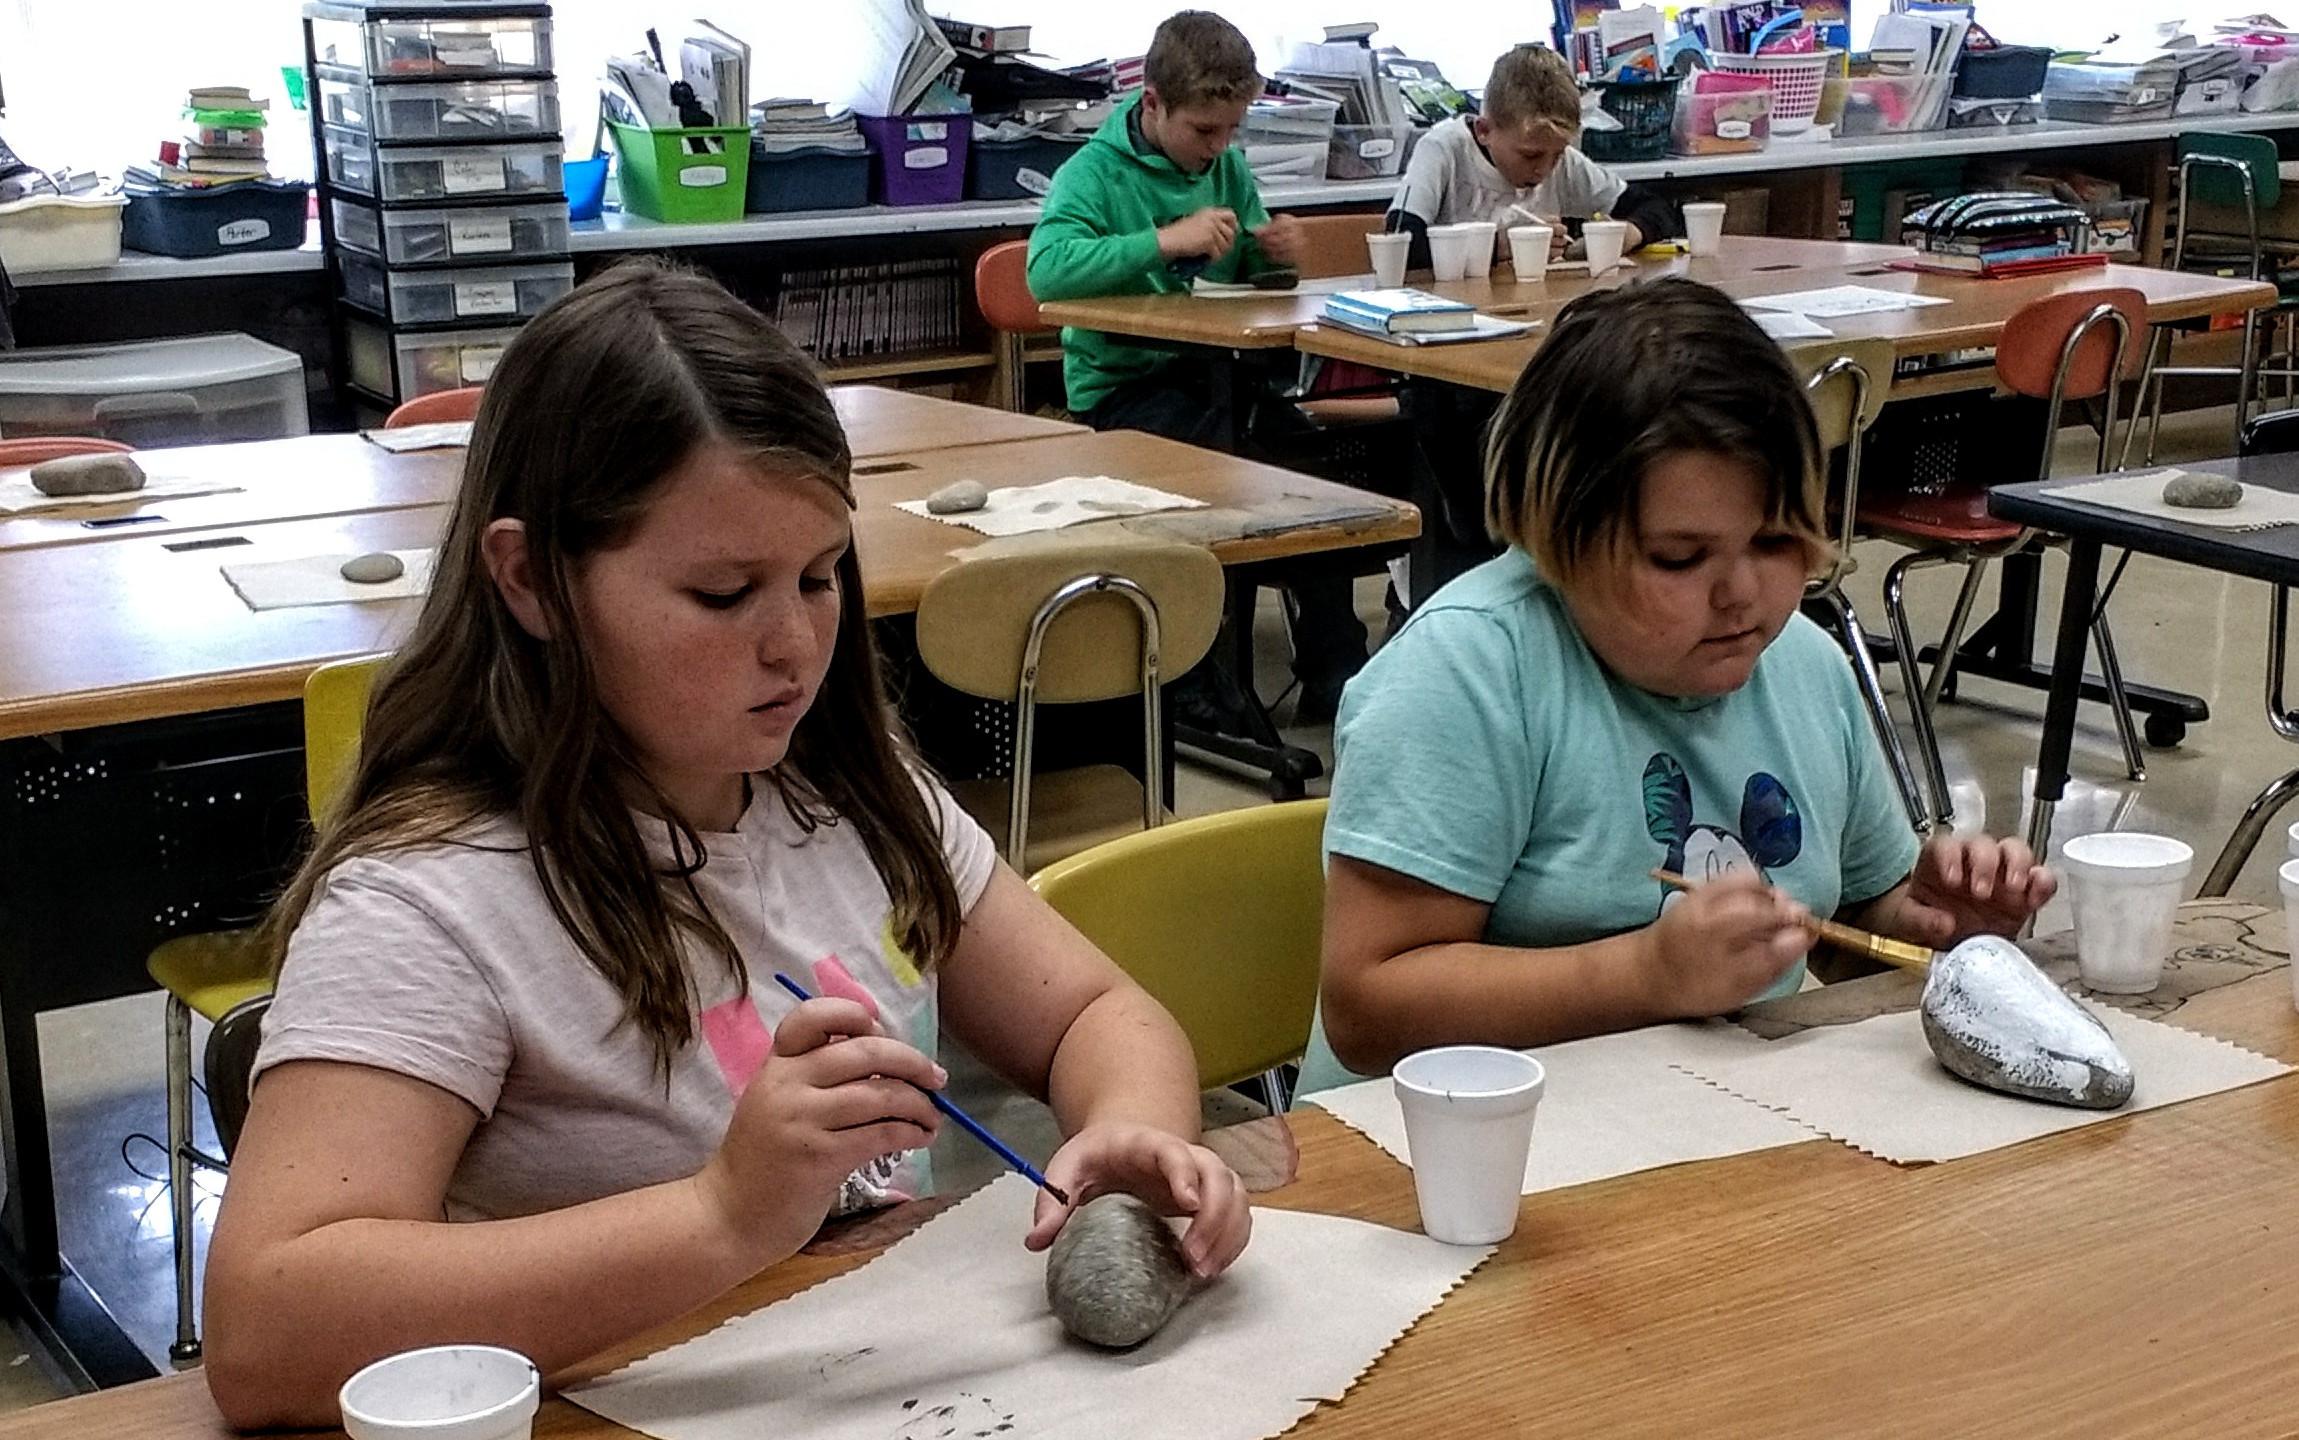 Hard at work! 5th grade girls get creative thanking a farmer with their design.